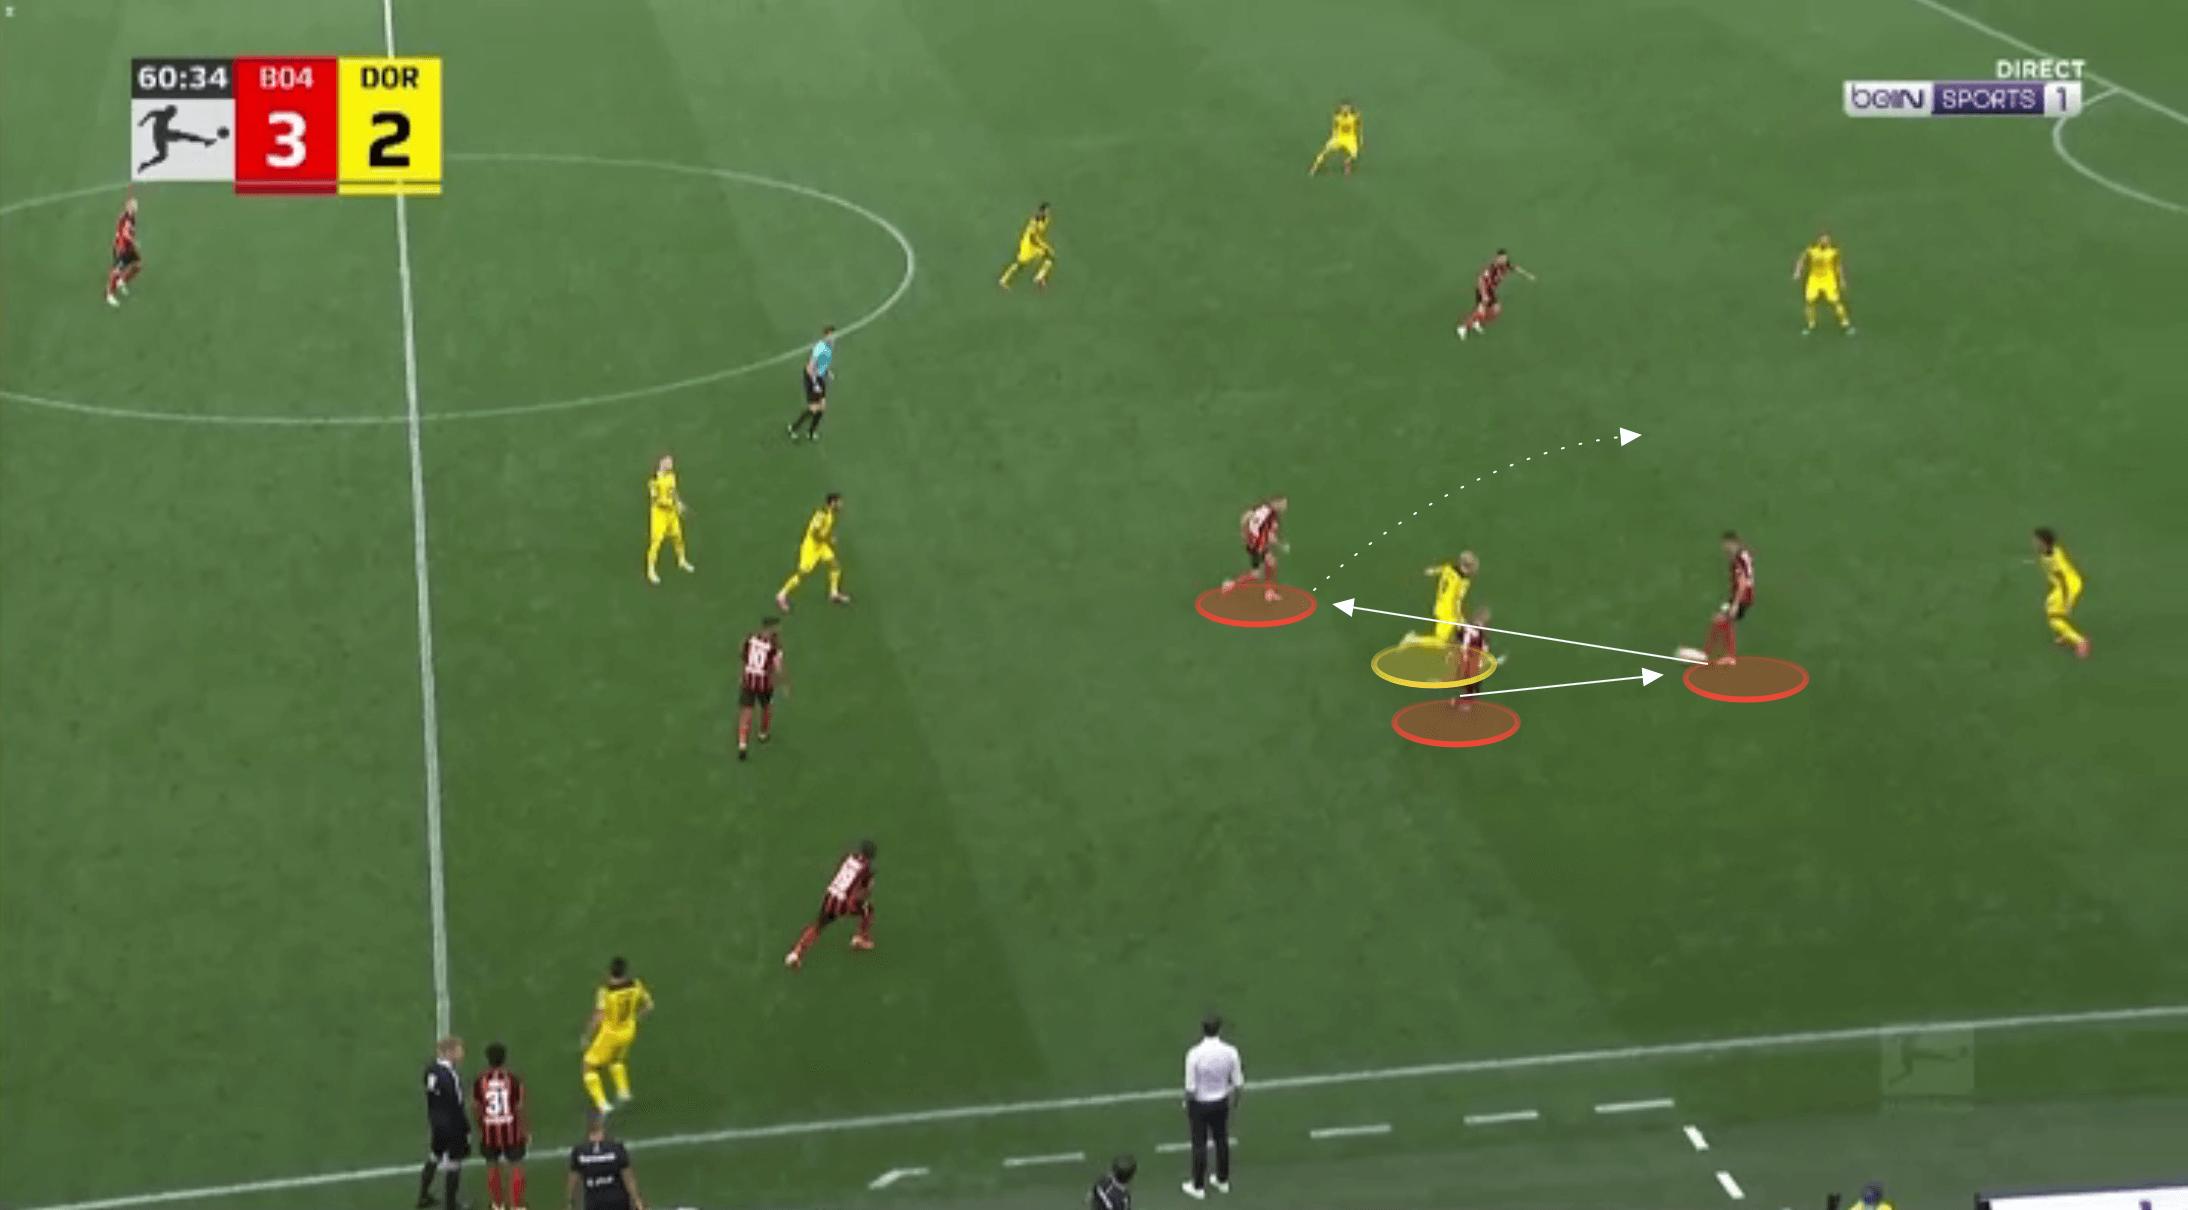 Bundesliga 2021/22: Bayer Leverkusen vs Borussia Dortmund - tactical analysis tactics